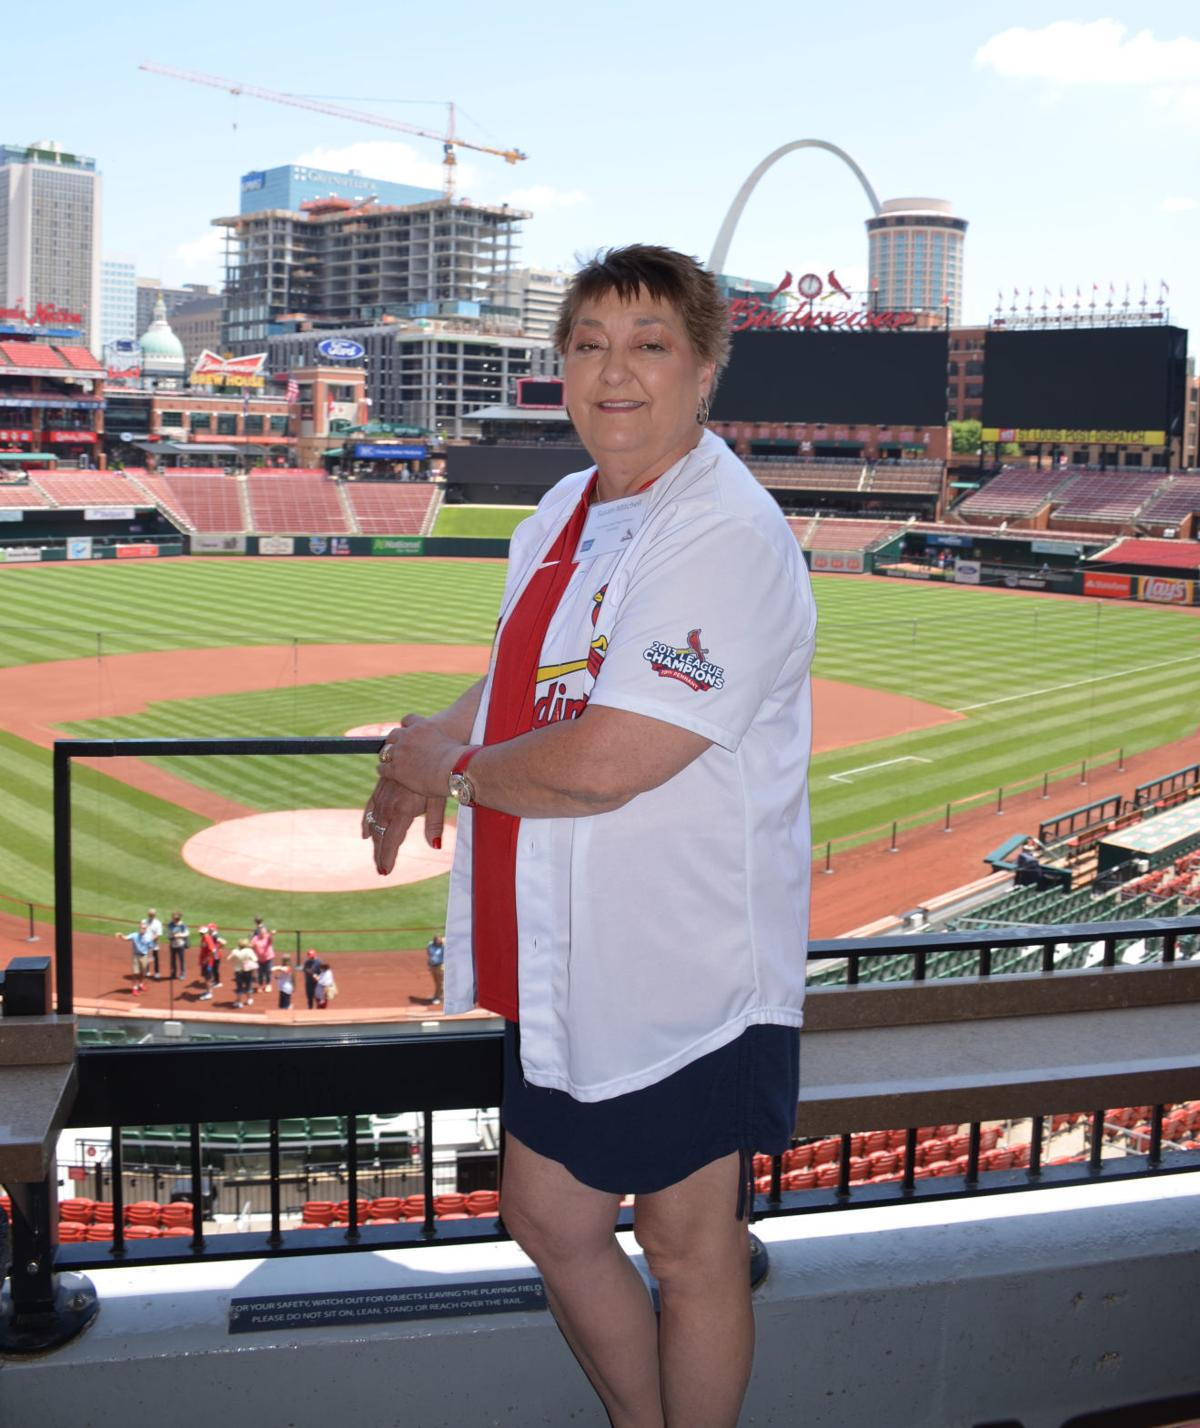 ACS Day at the Ballpark